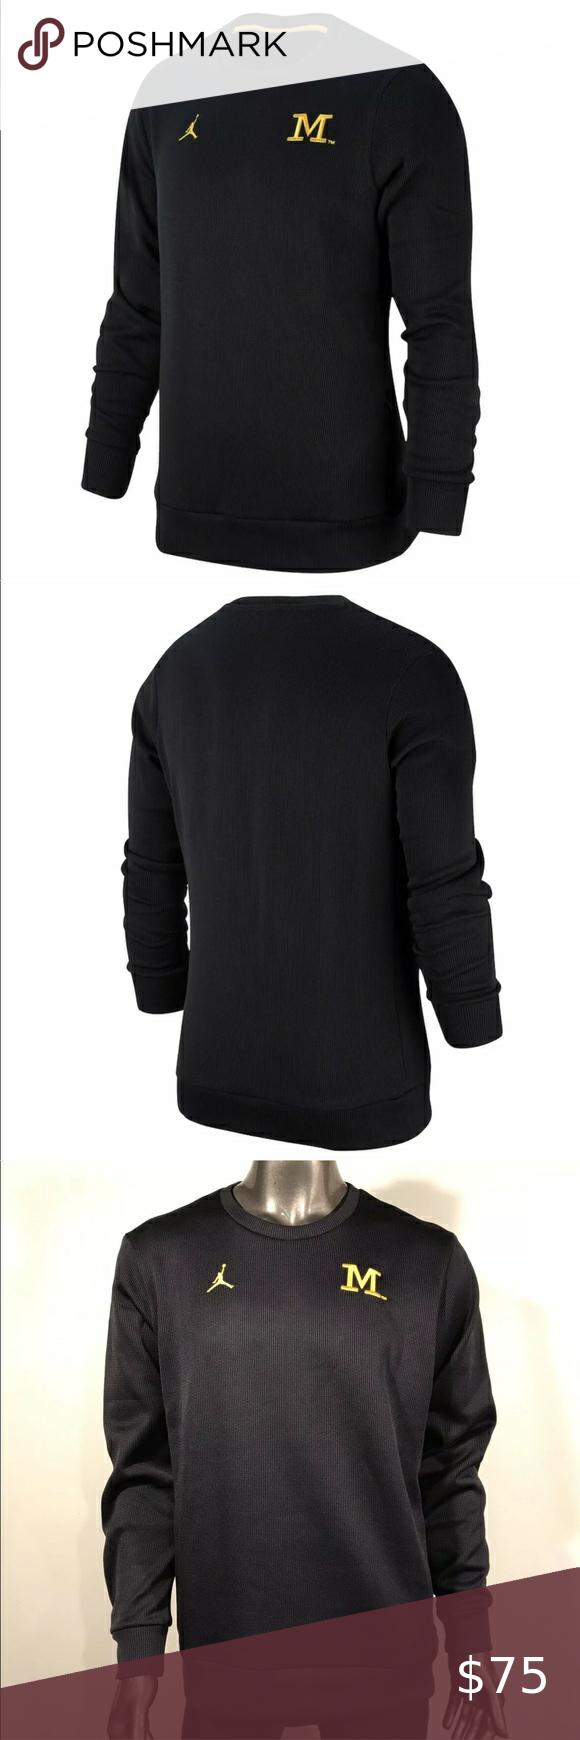 Michigan Wolverines Crew Xl Heavy Sweatshirt Heavy Sweatshirts Sweatshirts Sweatshirt Shirt [ 1740 x 580 Pixel ]